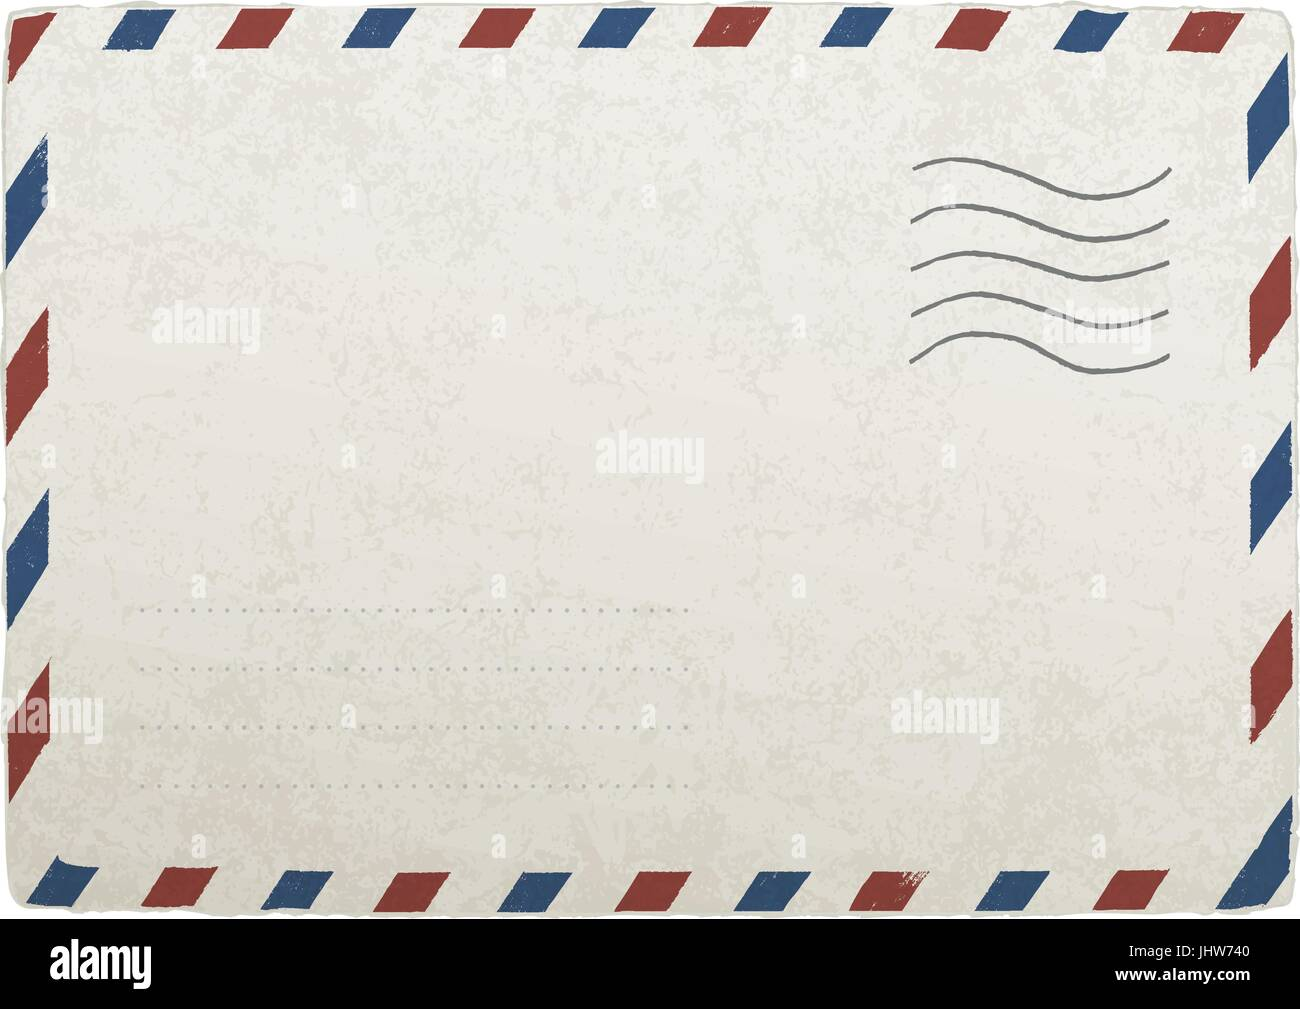 vintage mailing envelope vector template for your designs eps 10